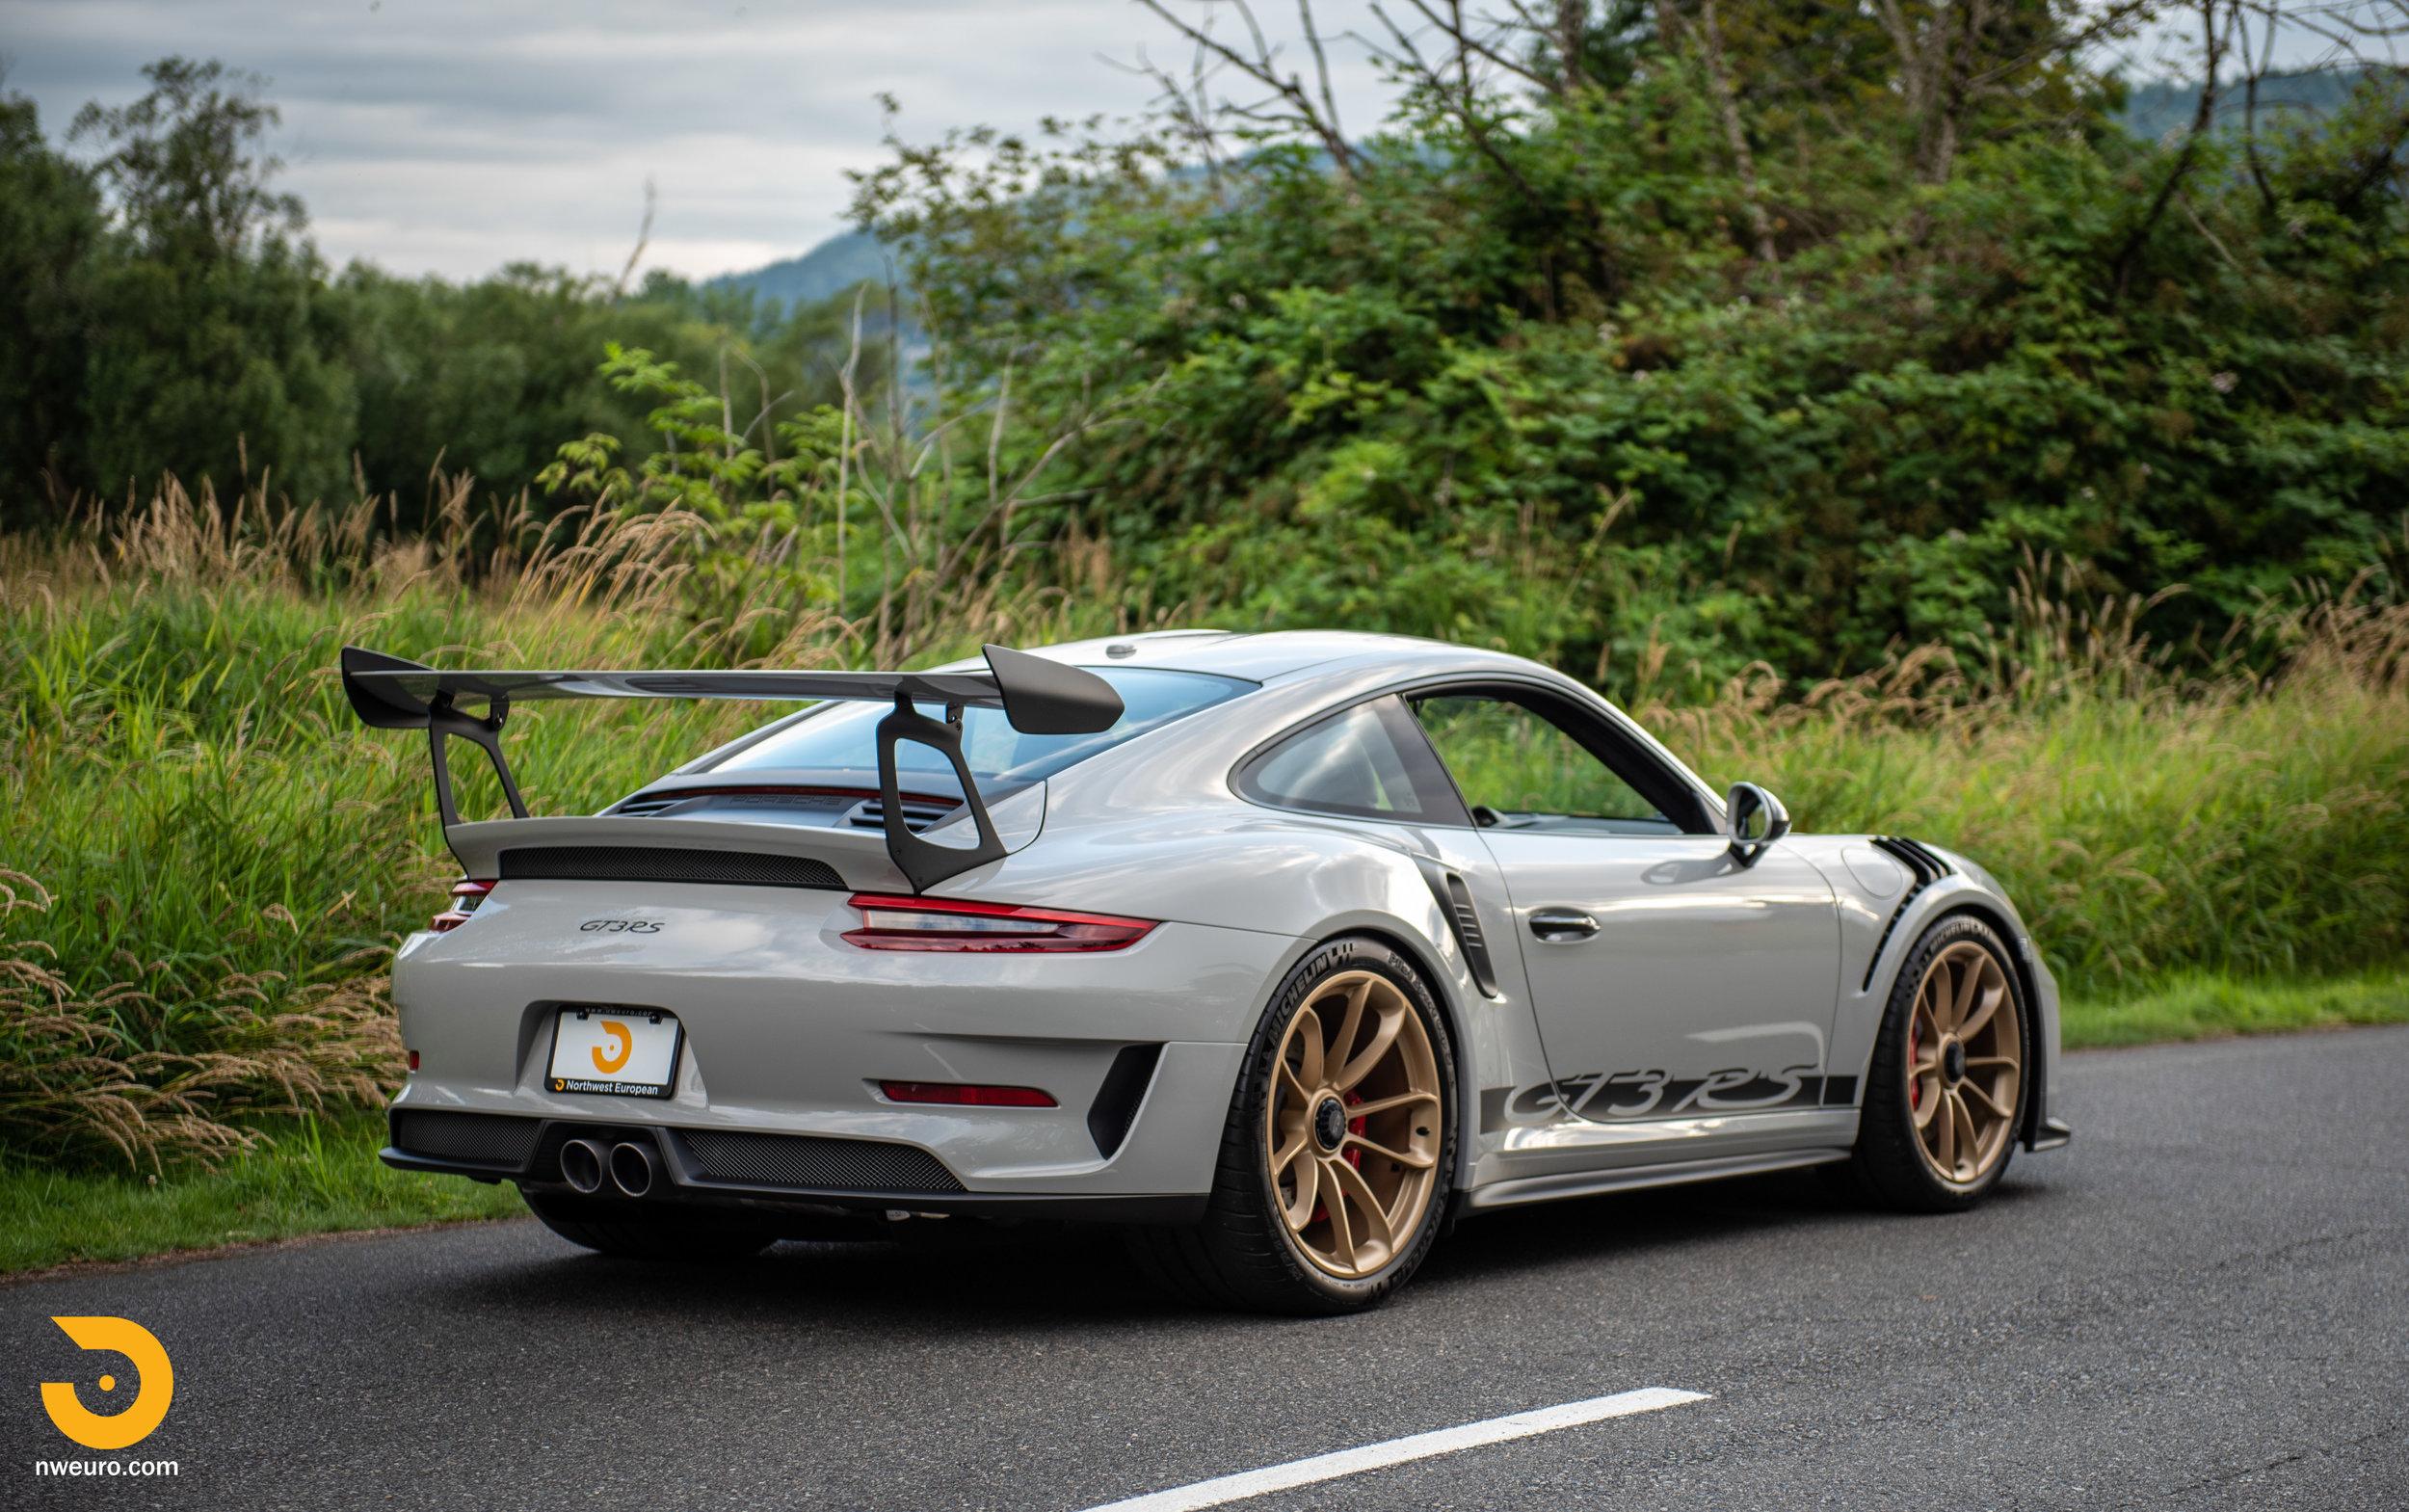 2019 Porsche GT3 RS - Chalk-56.jpg